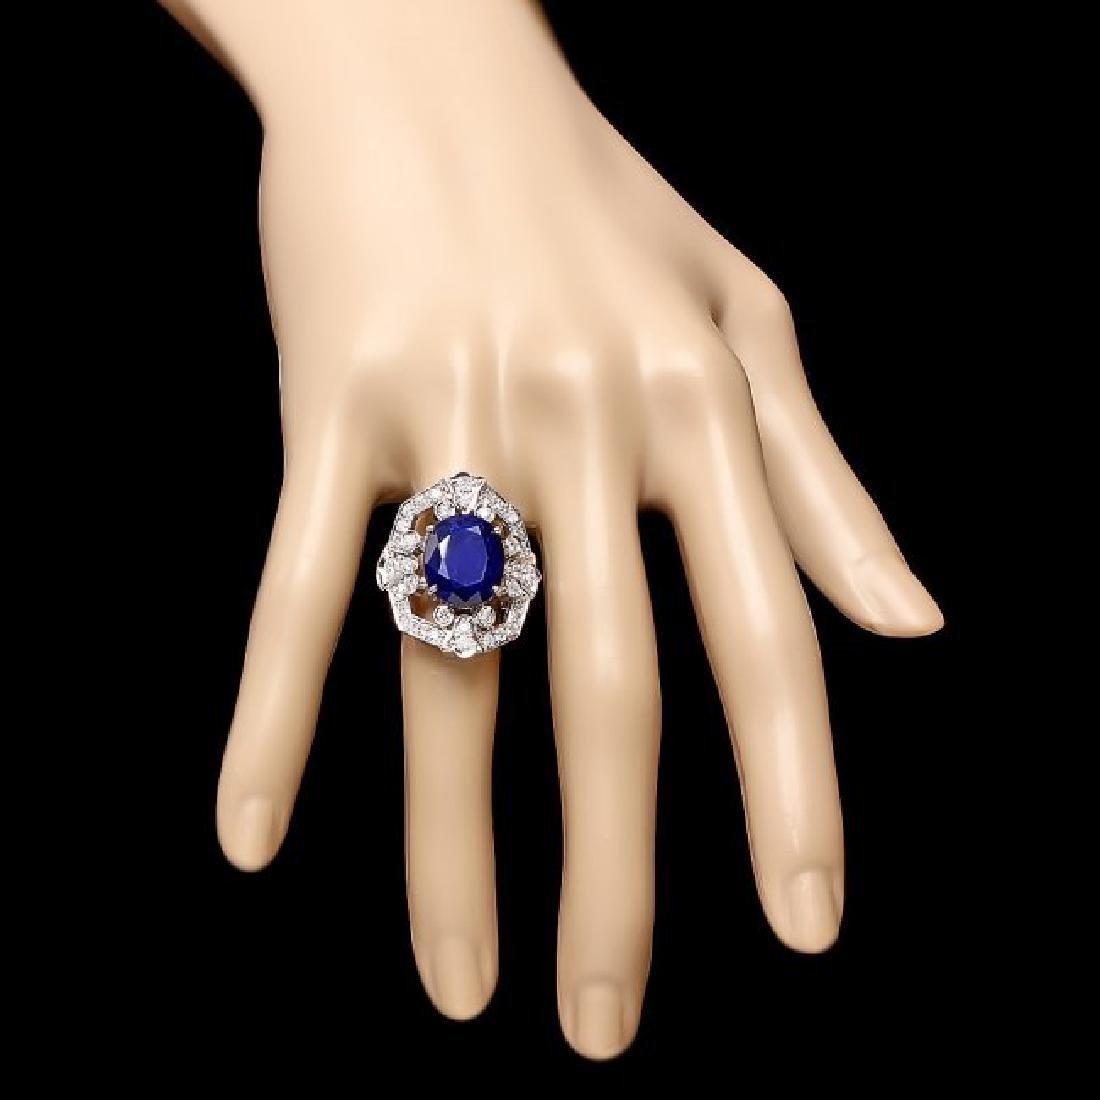 14k Gold 9.00ct Sapphire 1.30ct Diamond Ring - 4